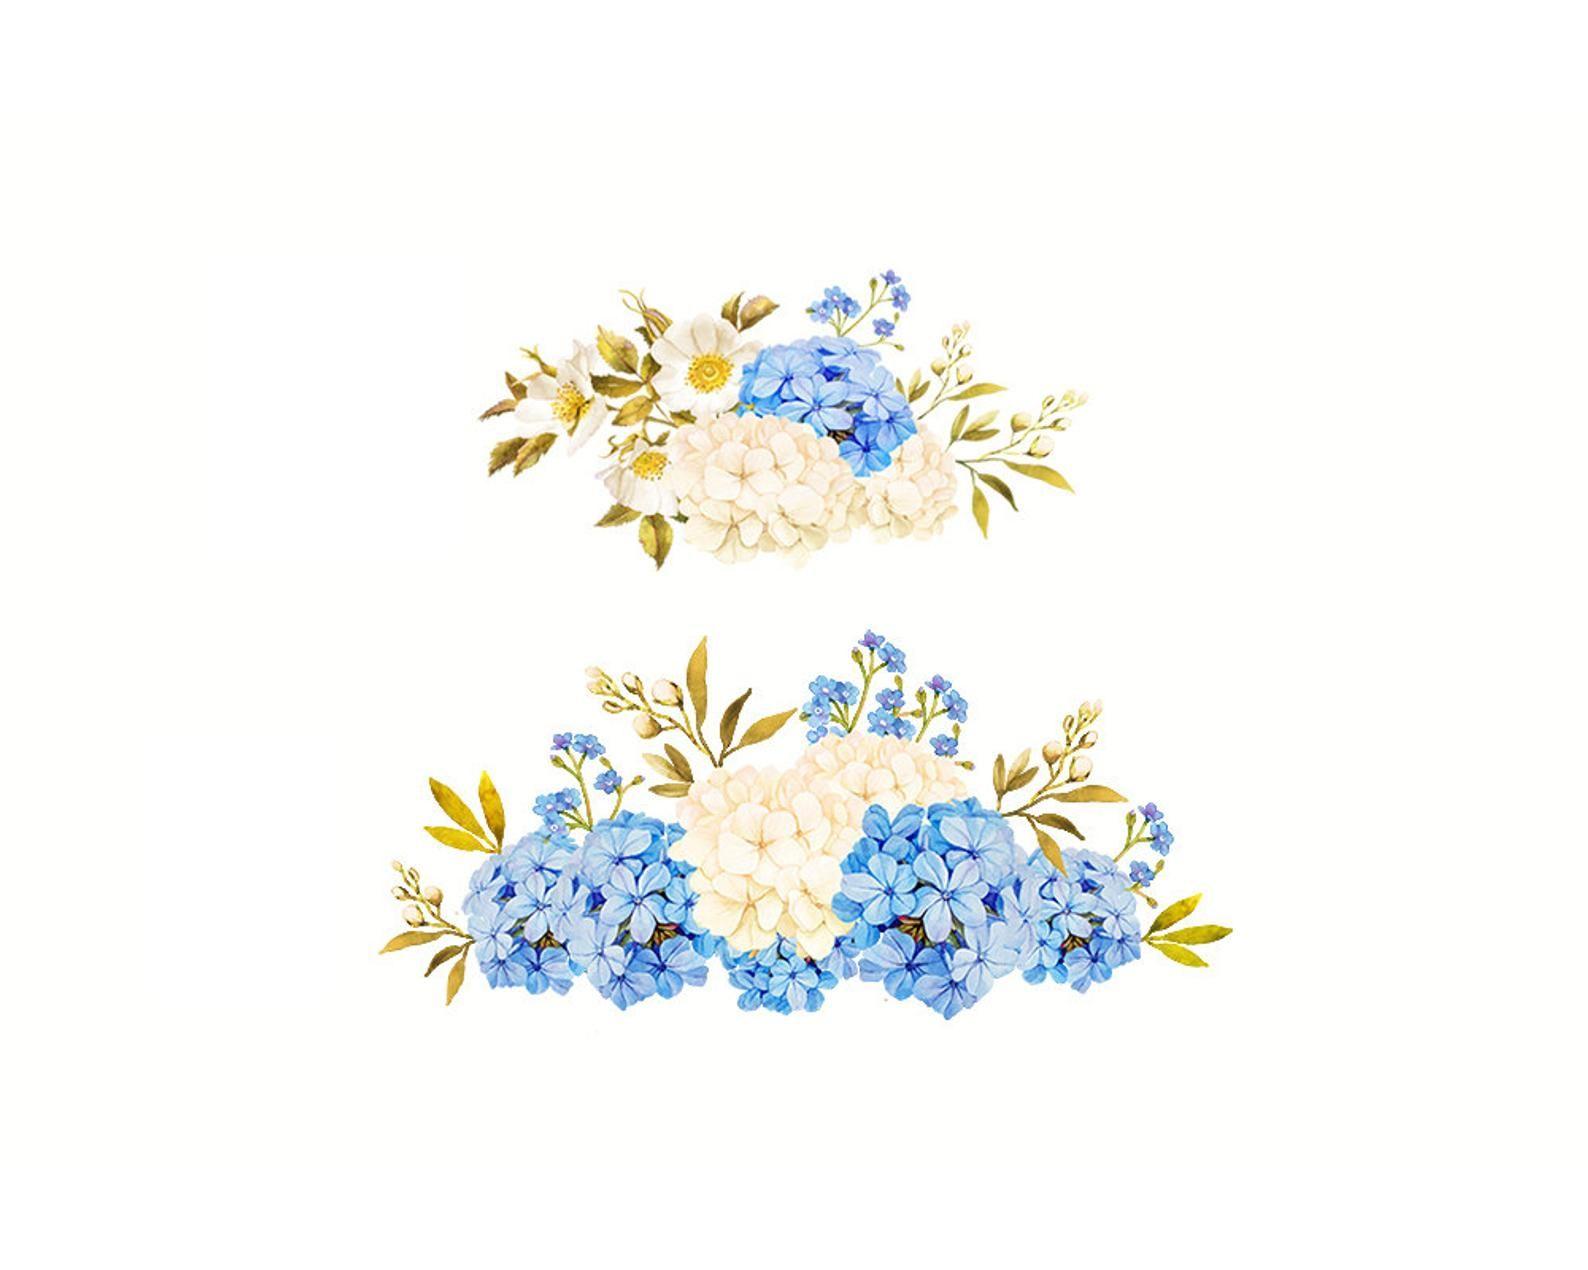 Flower Watercolor Clipart Floral Clipart Blue Jasmine Clipart Hydrangea Clipart Blue White Clipart Blue Gold Clipart White Roses Watercolor Flowers Flower Clipart Flower Illustration